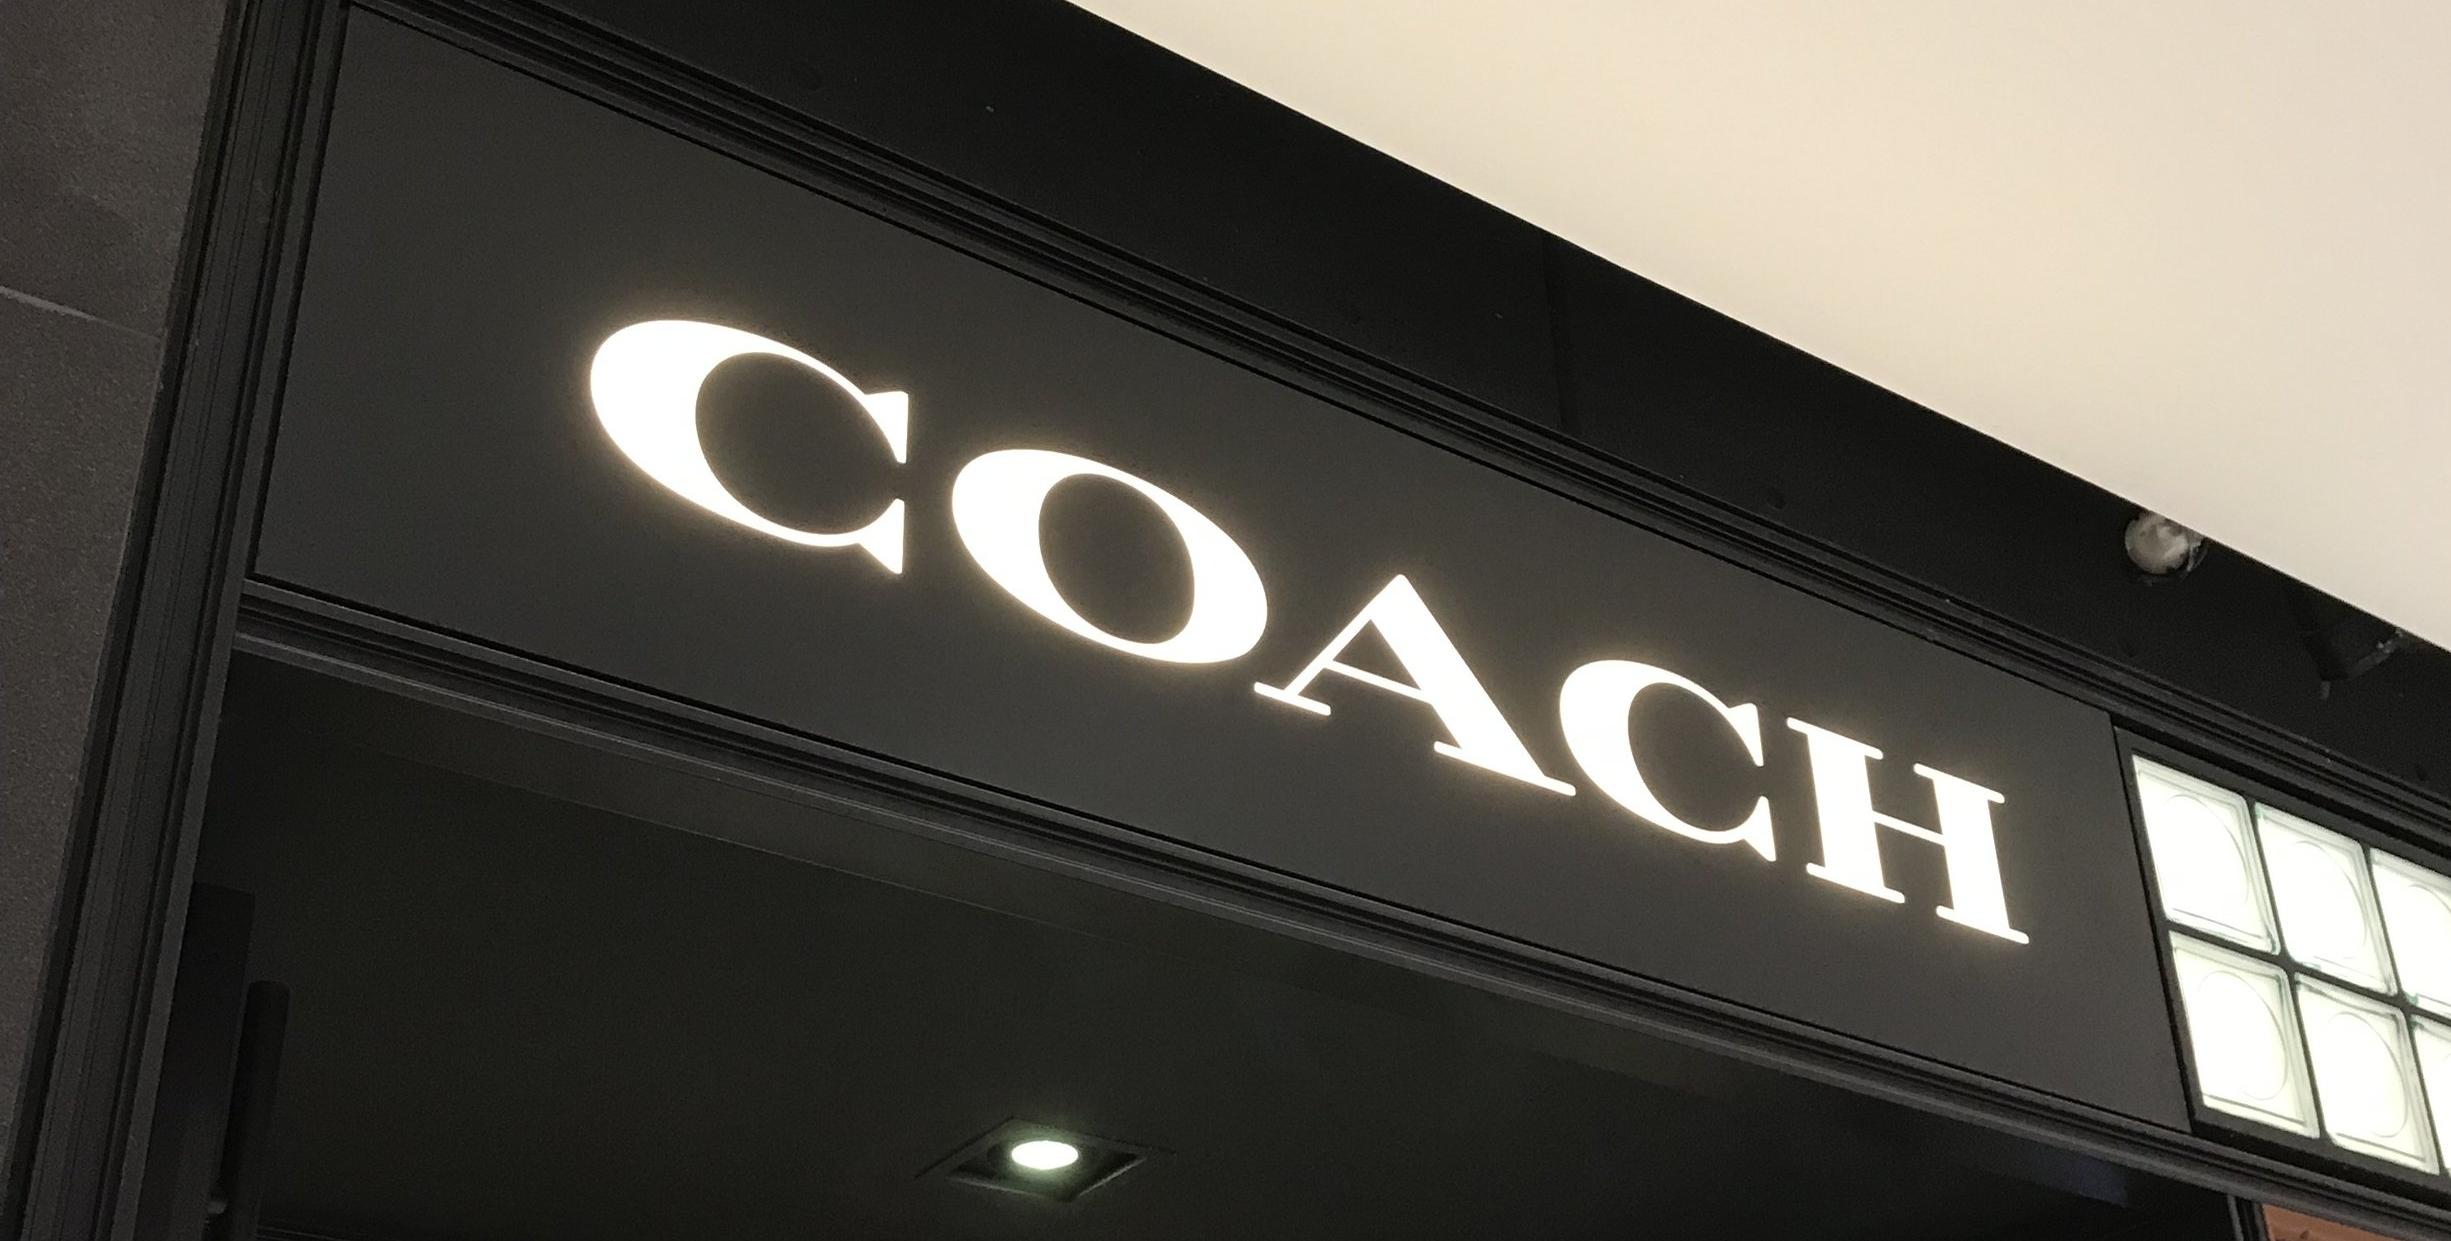 Signage we installed for Coach @ Rideau Shopping Centre Ottawa